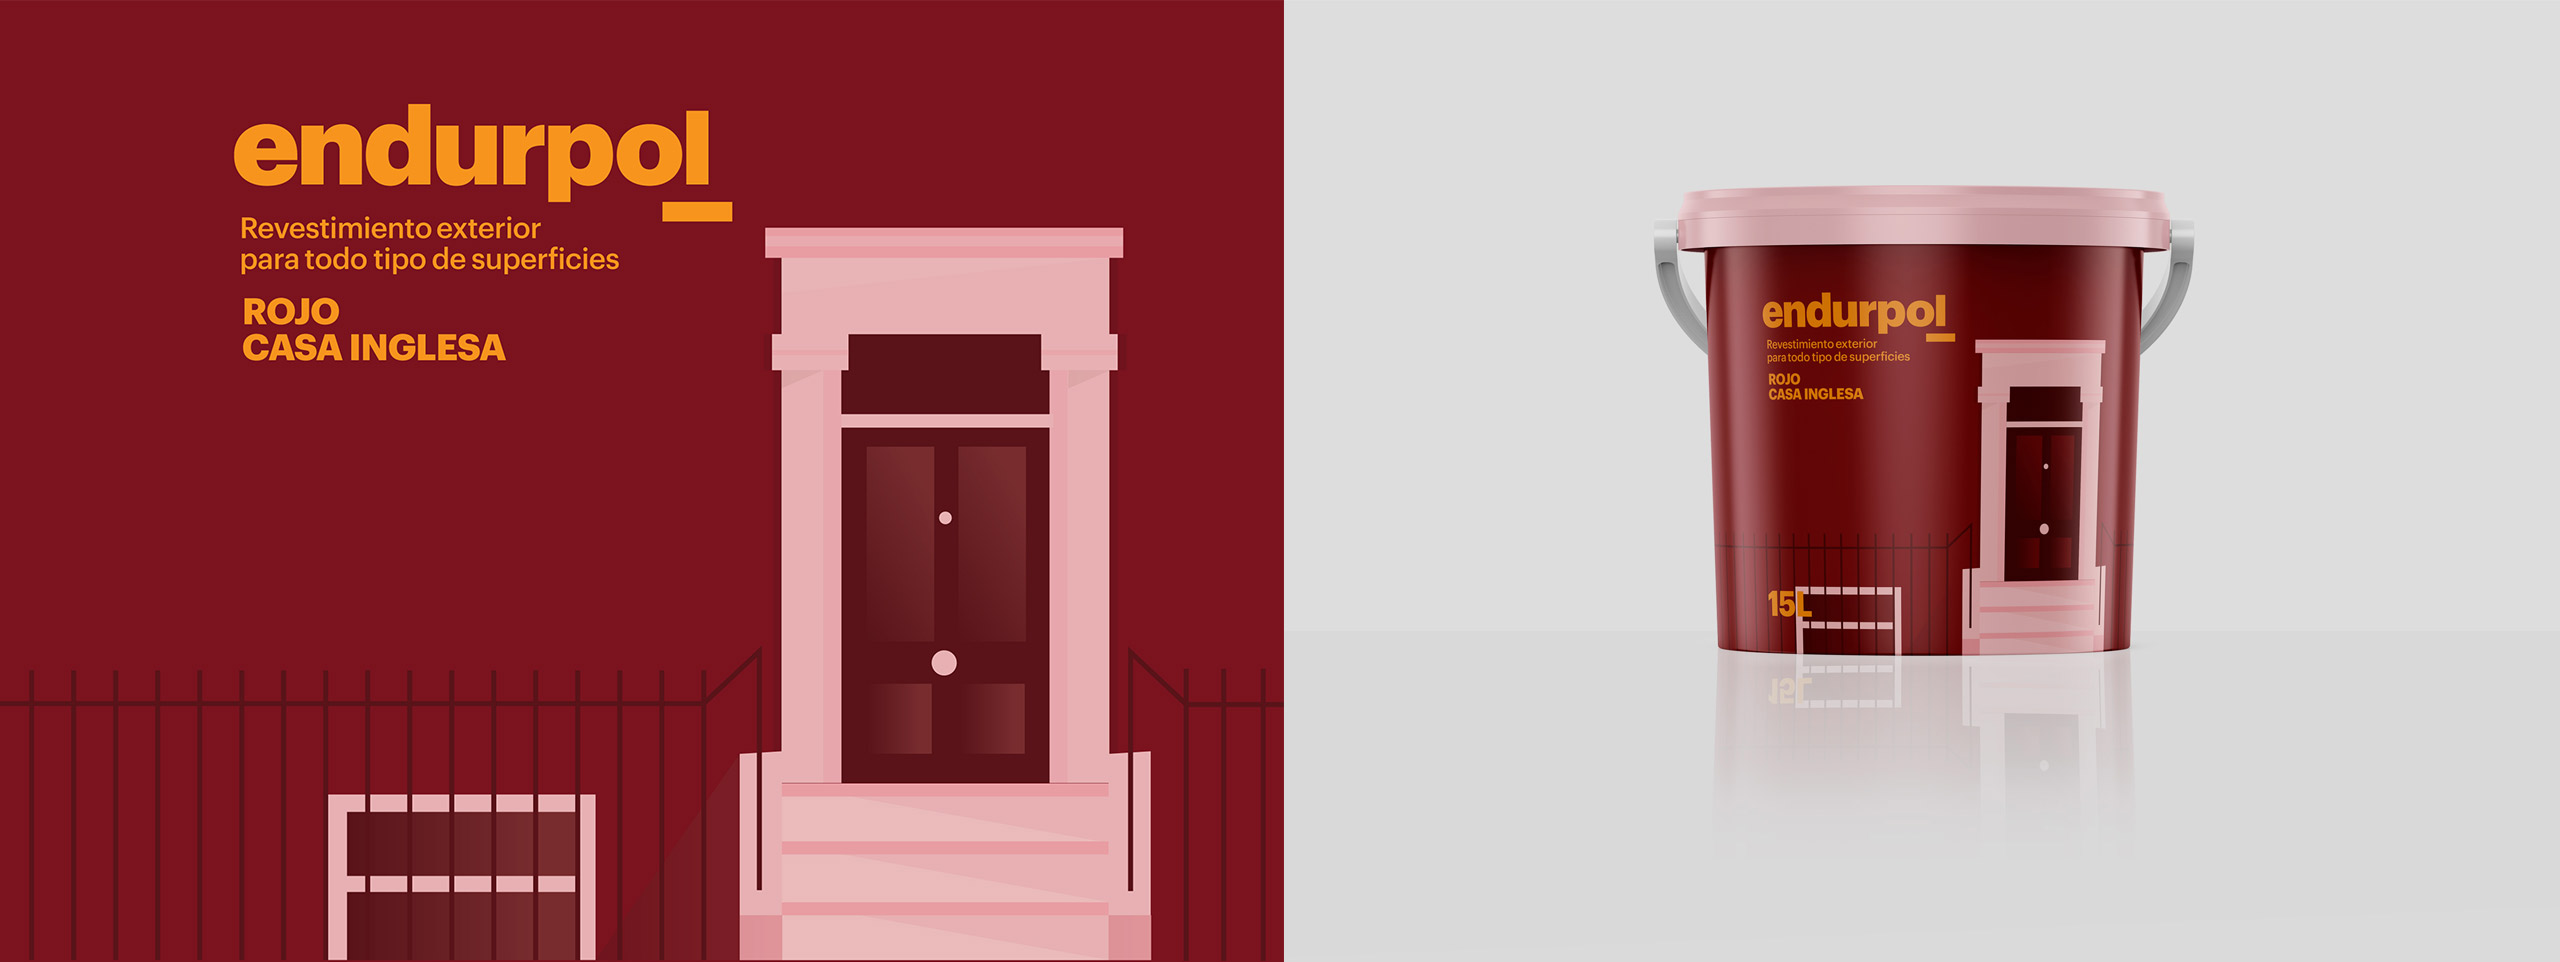 marinagoni-endurpol-packaging-pintura-roja